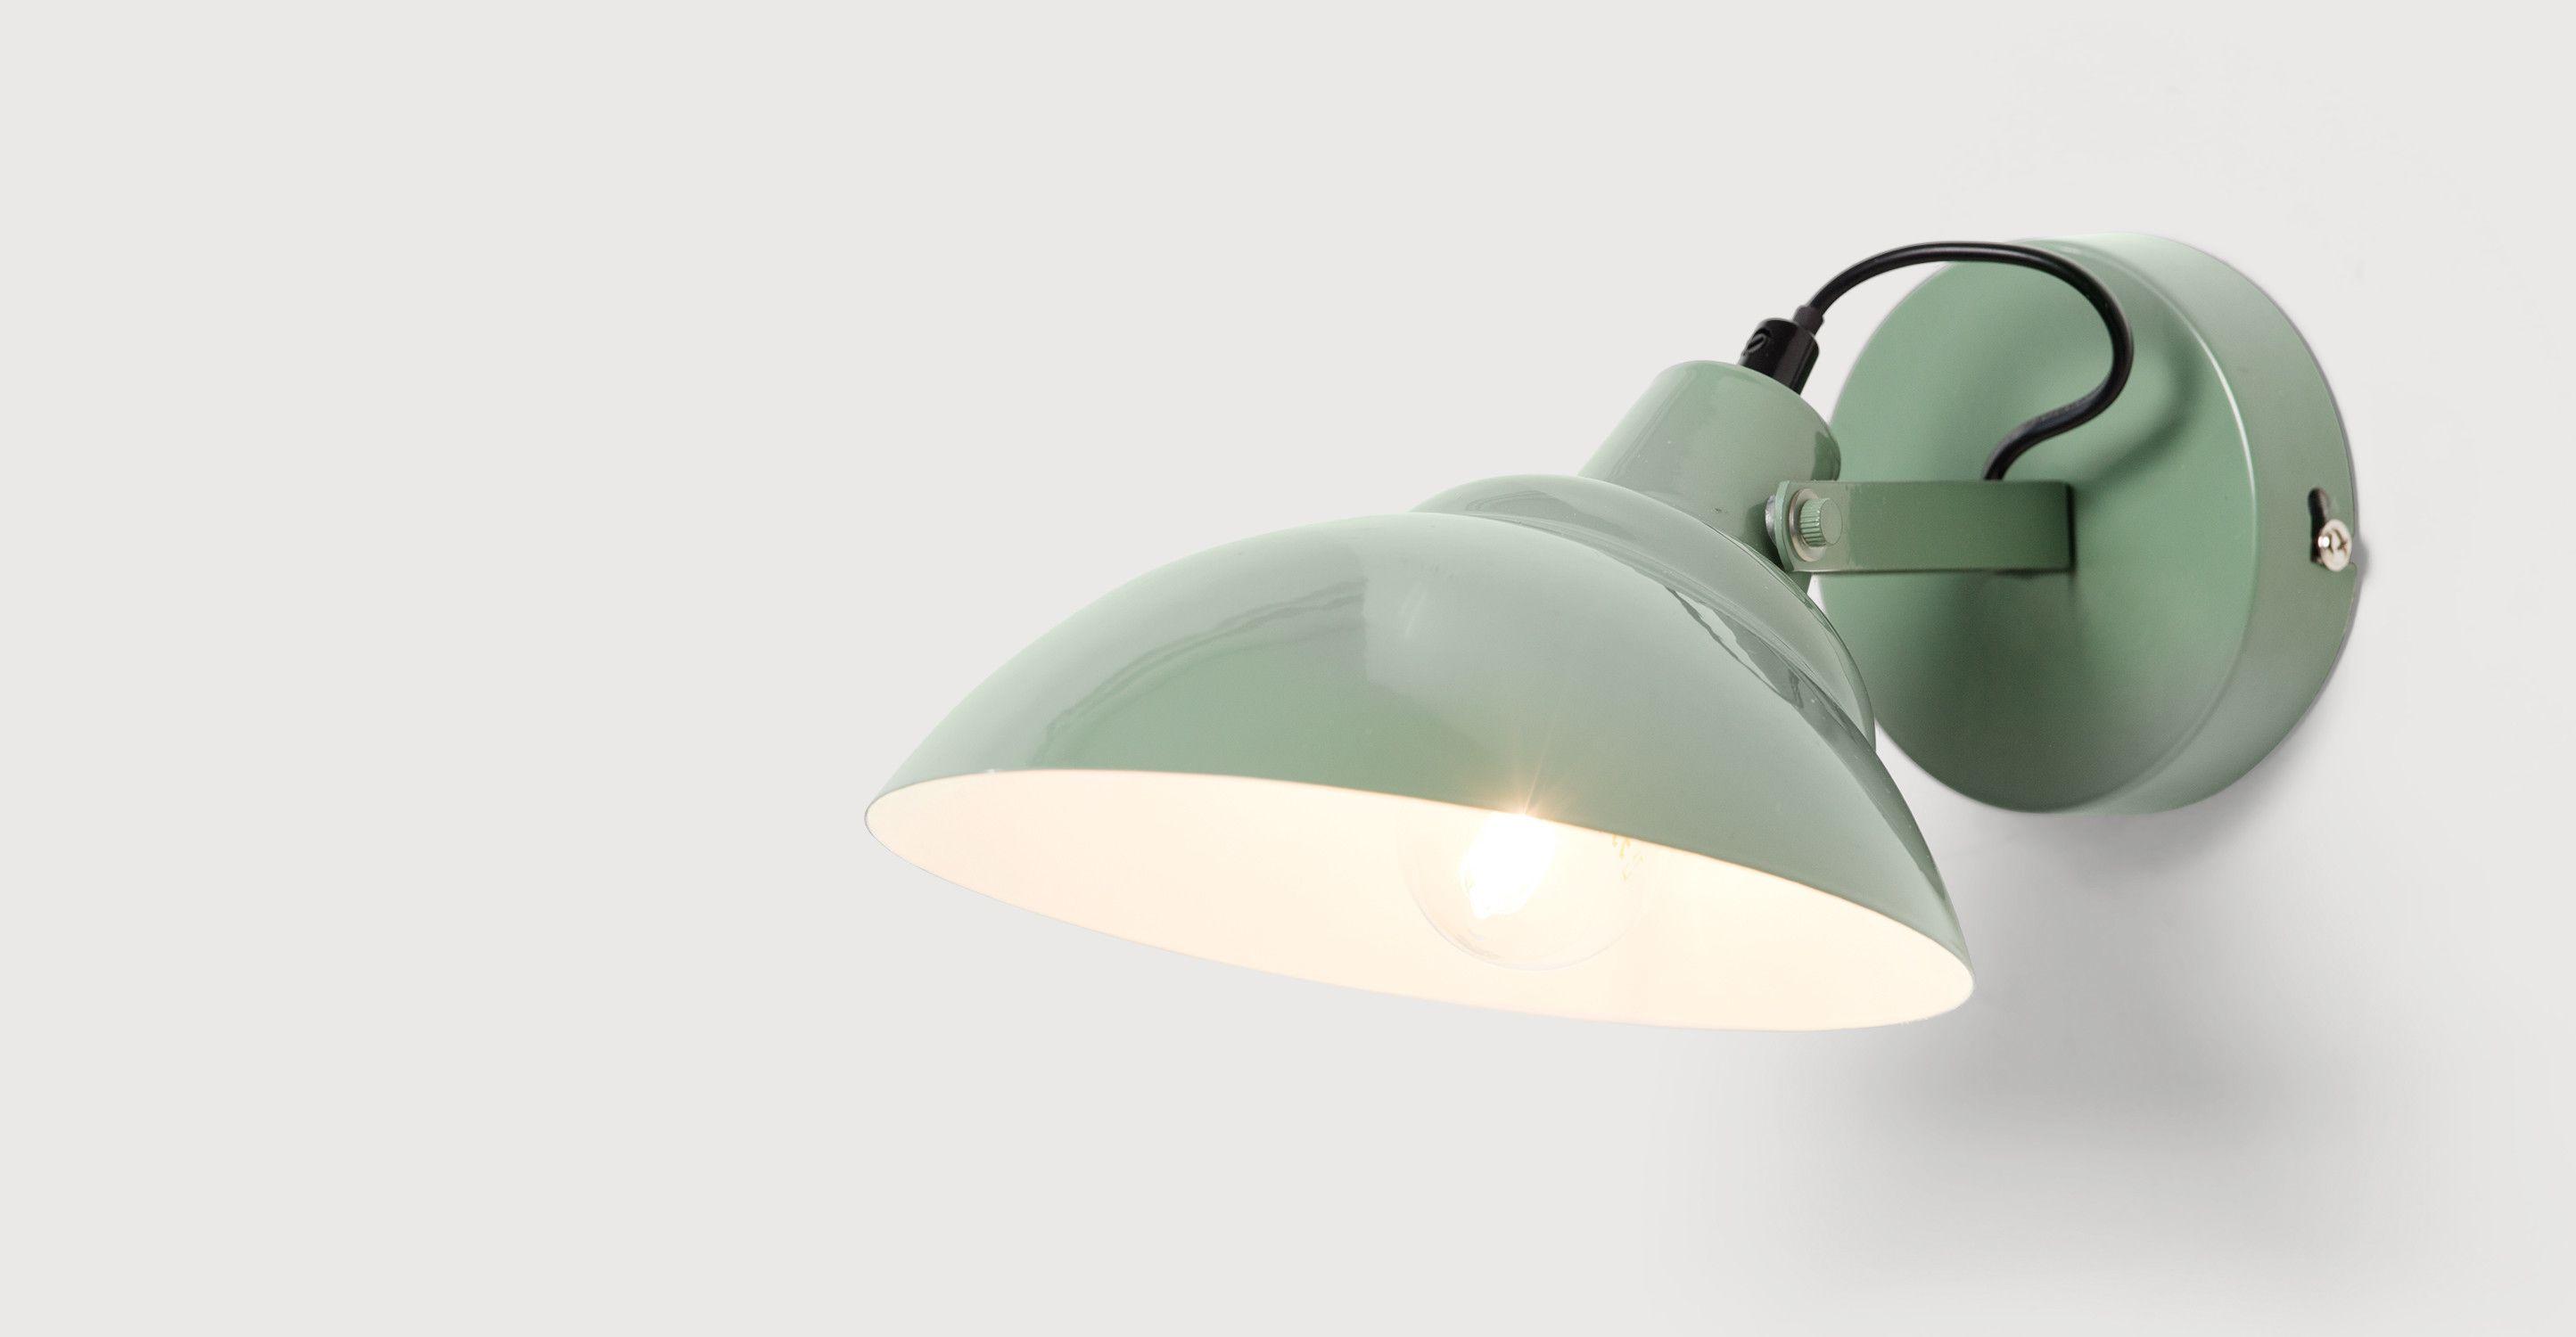 avery wandleuchte moosgr n wohnung pinterest lampen wandleuchte und beleuchtung. Black Bedroom Furniture Sets. Home Design Ideas